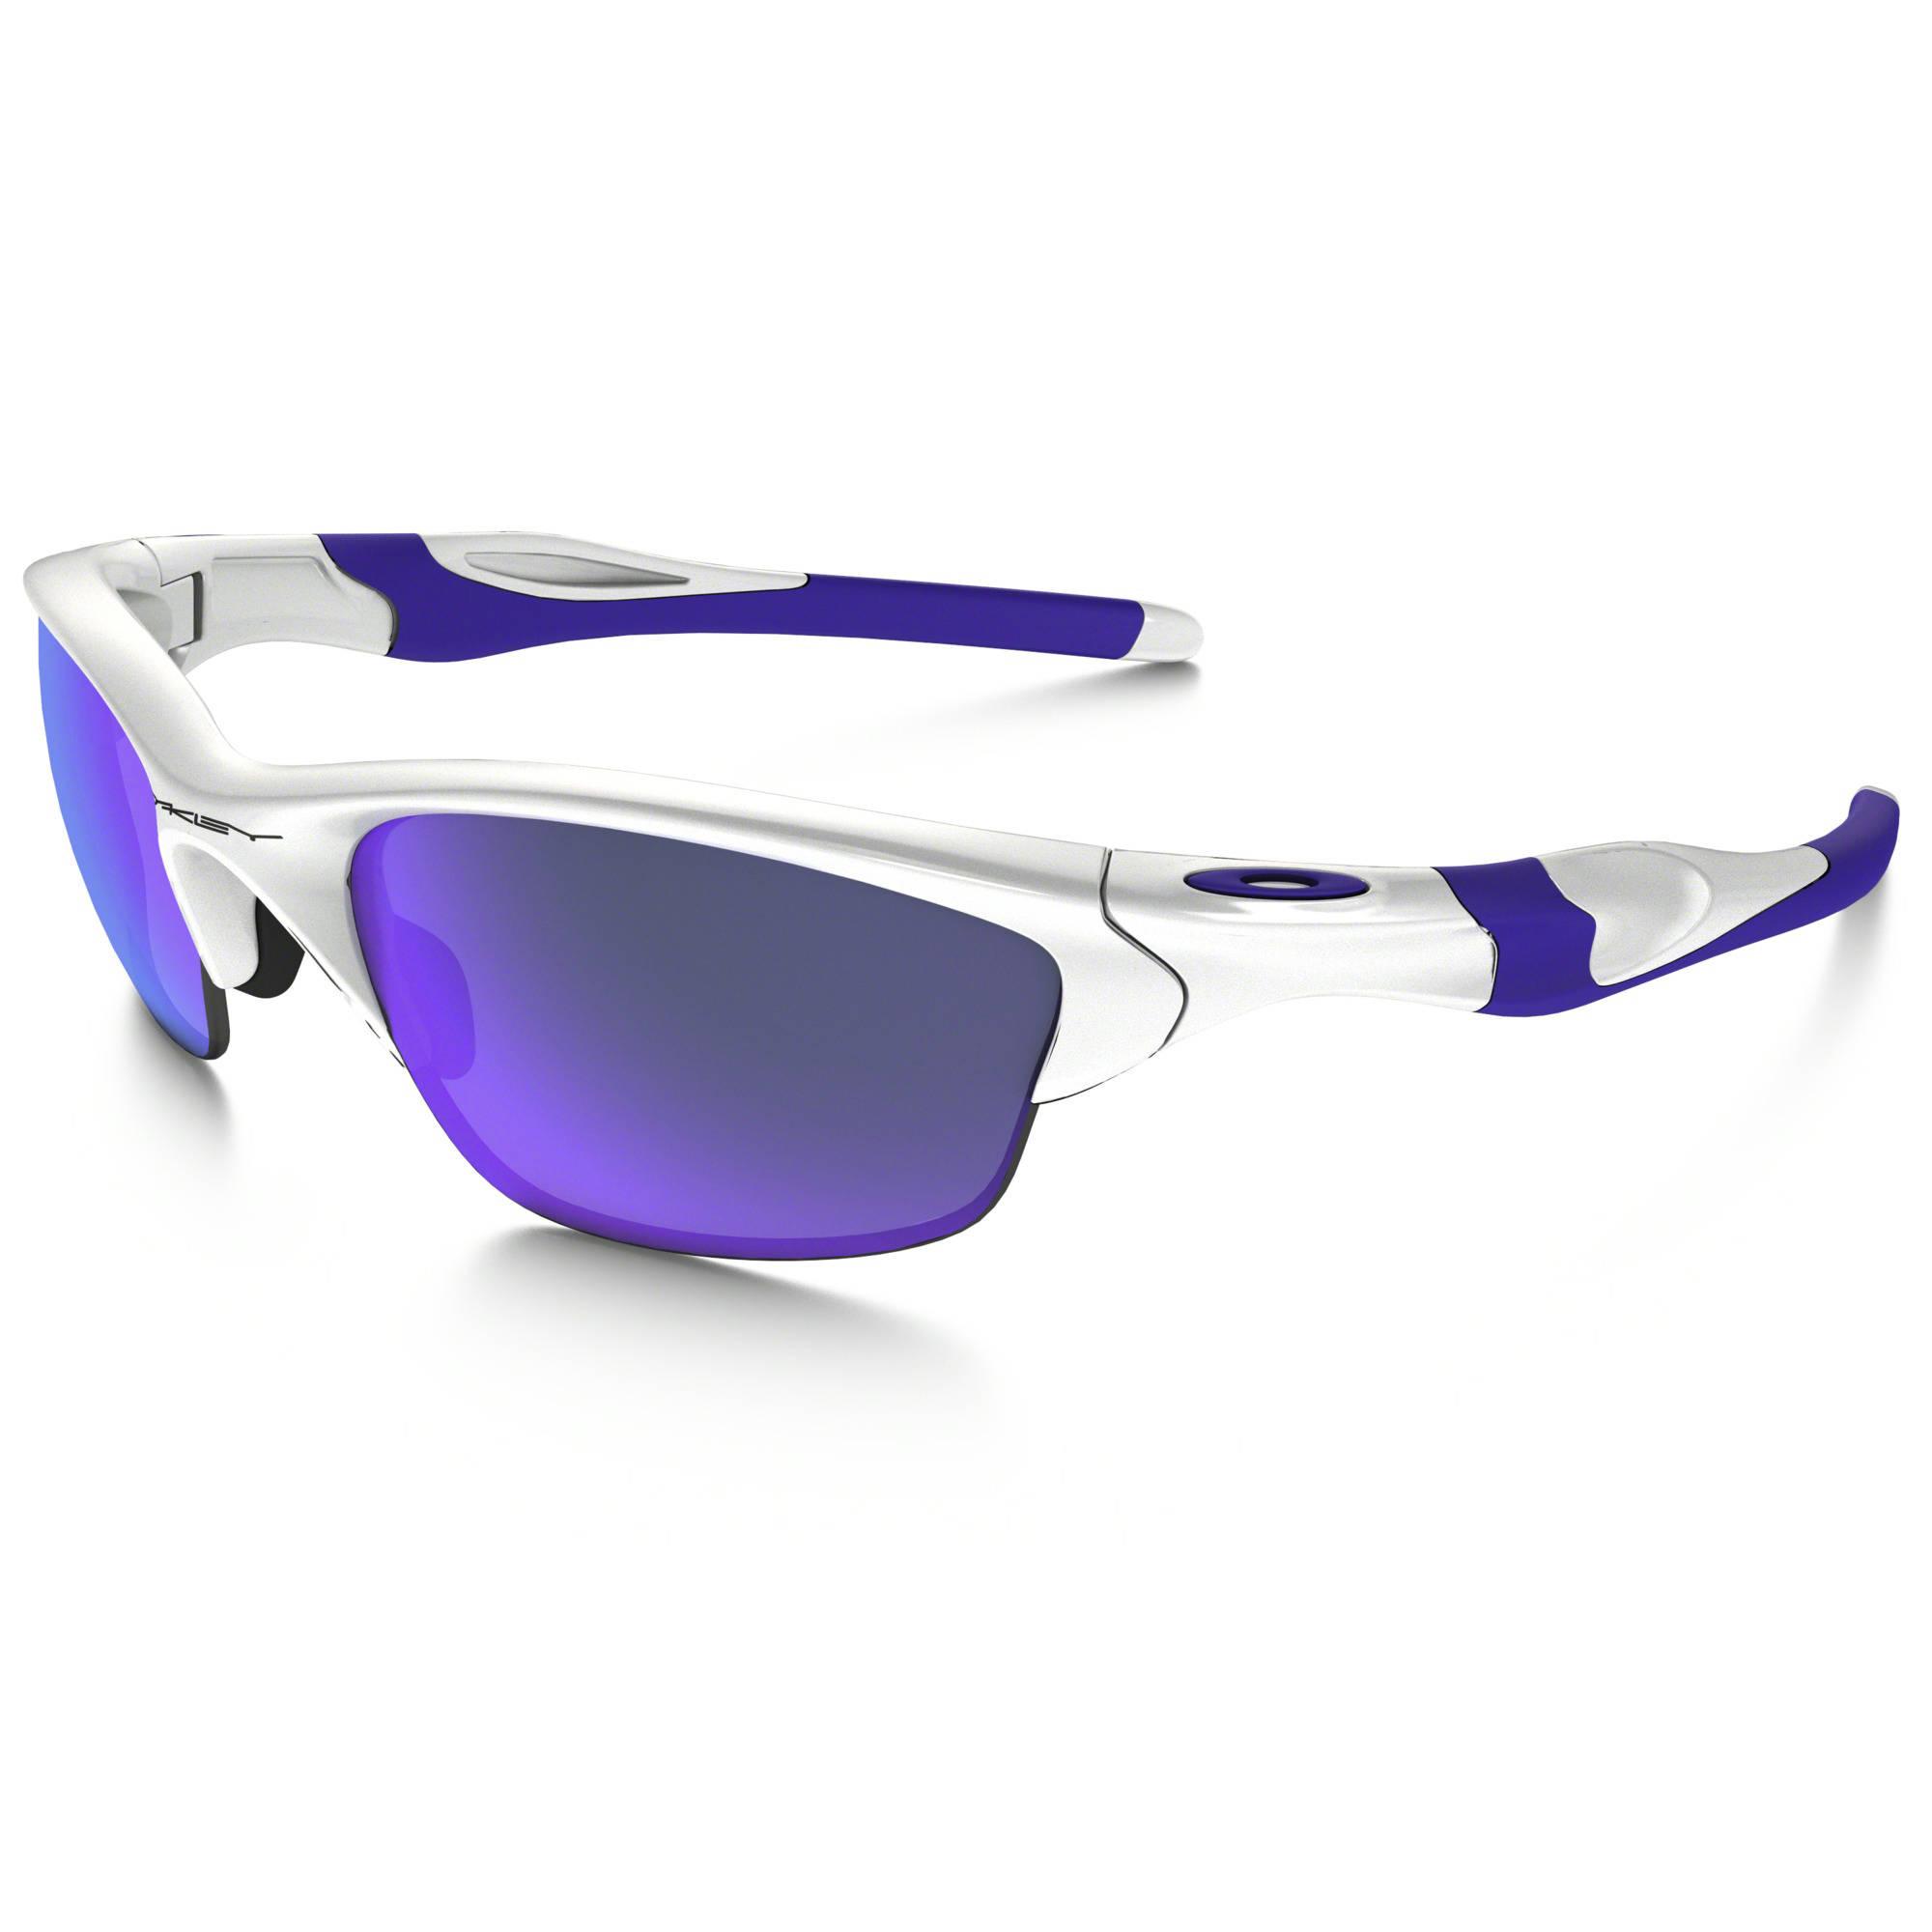 Oakley Half Jacket 2.0 Sunglasses 0OO9144-91440862 B&H Photo